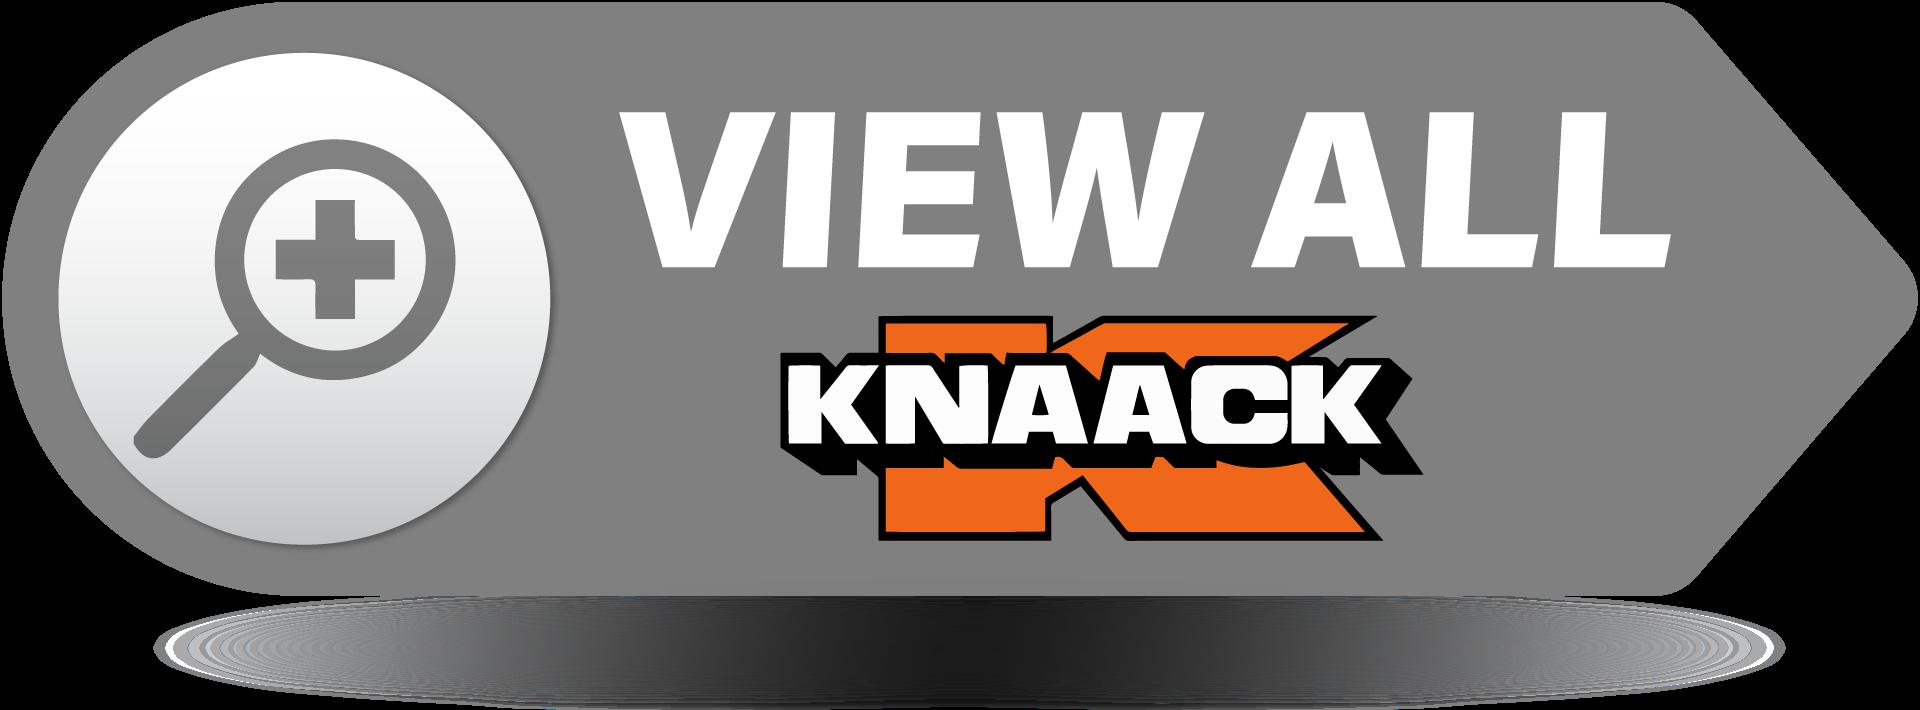 KNAACK JOB BOX SALE LOGO PNG